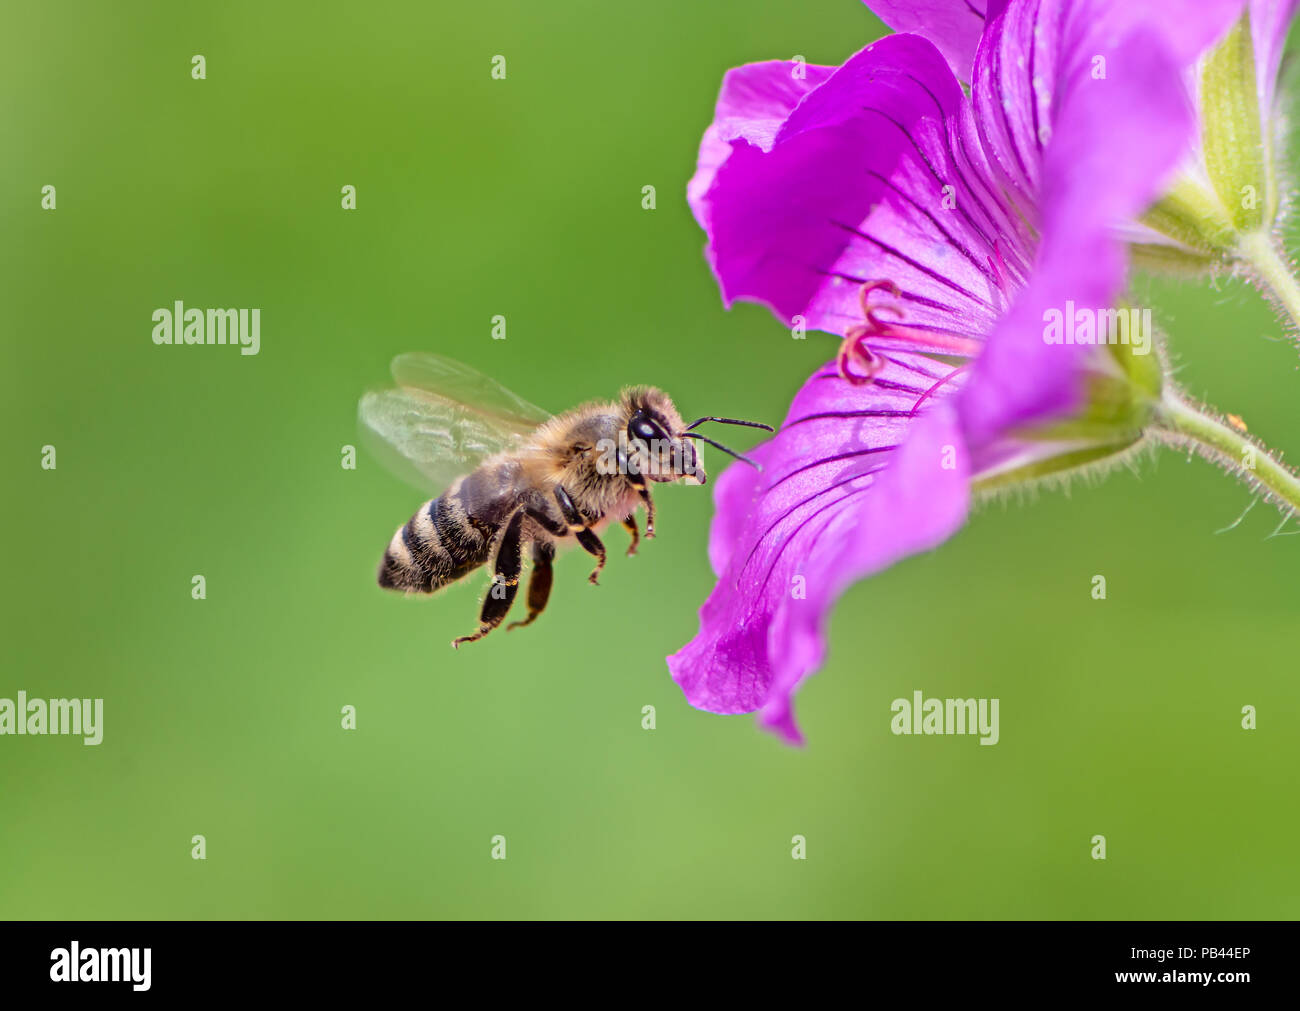 Honeybee flying to a purple geranium flower blossom - Stock Image